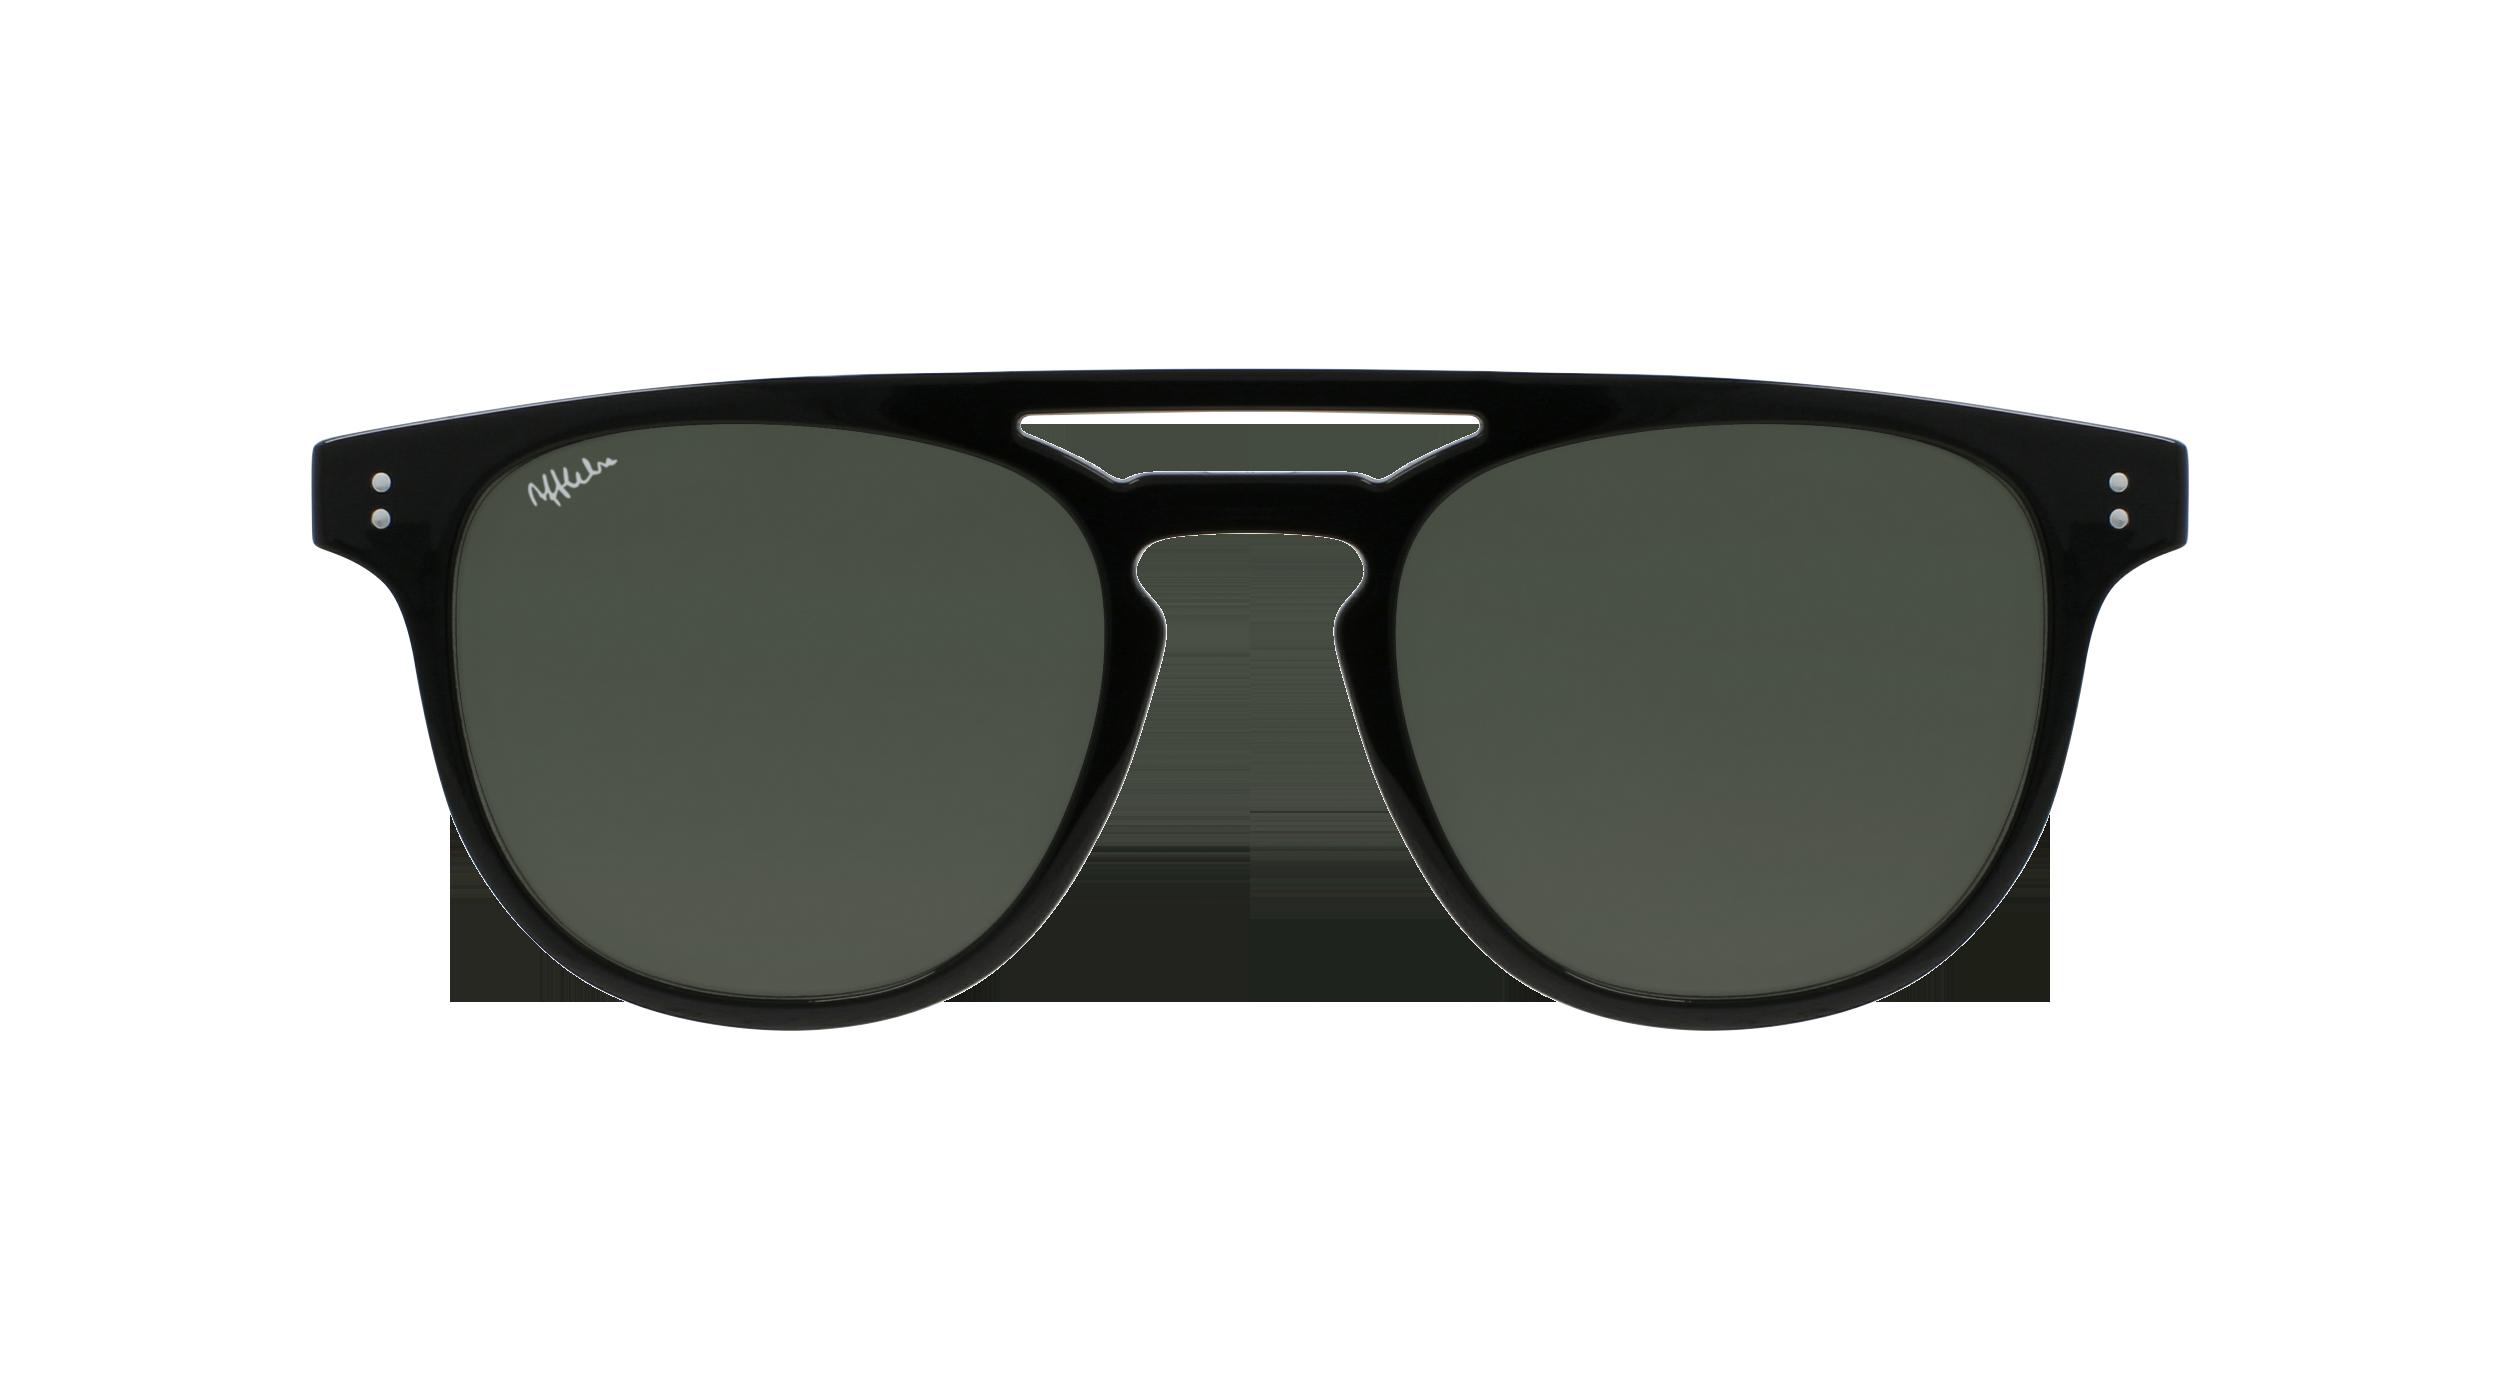 afflelou/france/products/smart_clip/clips_glasses/07630036436141.png